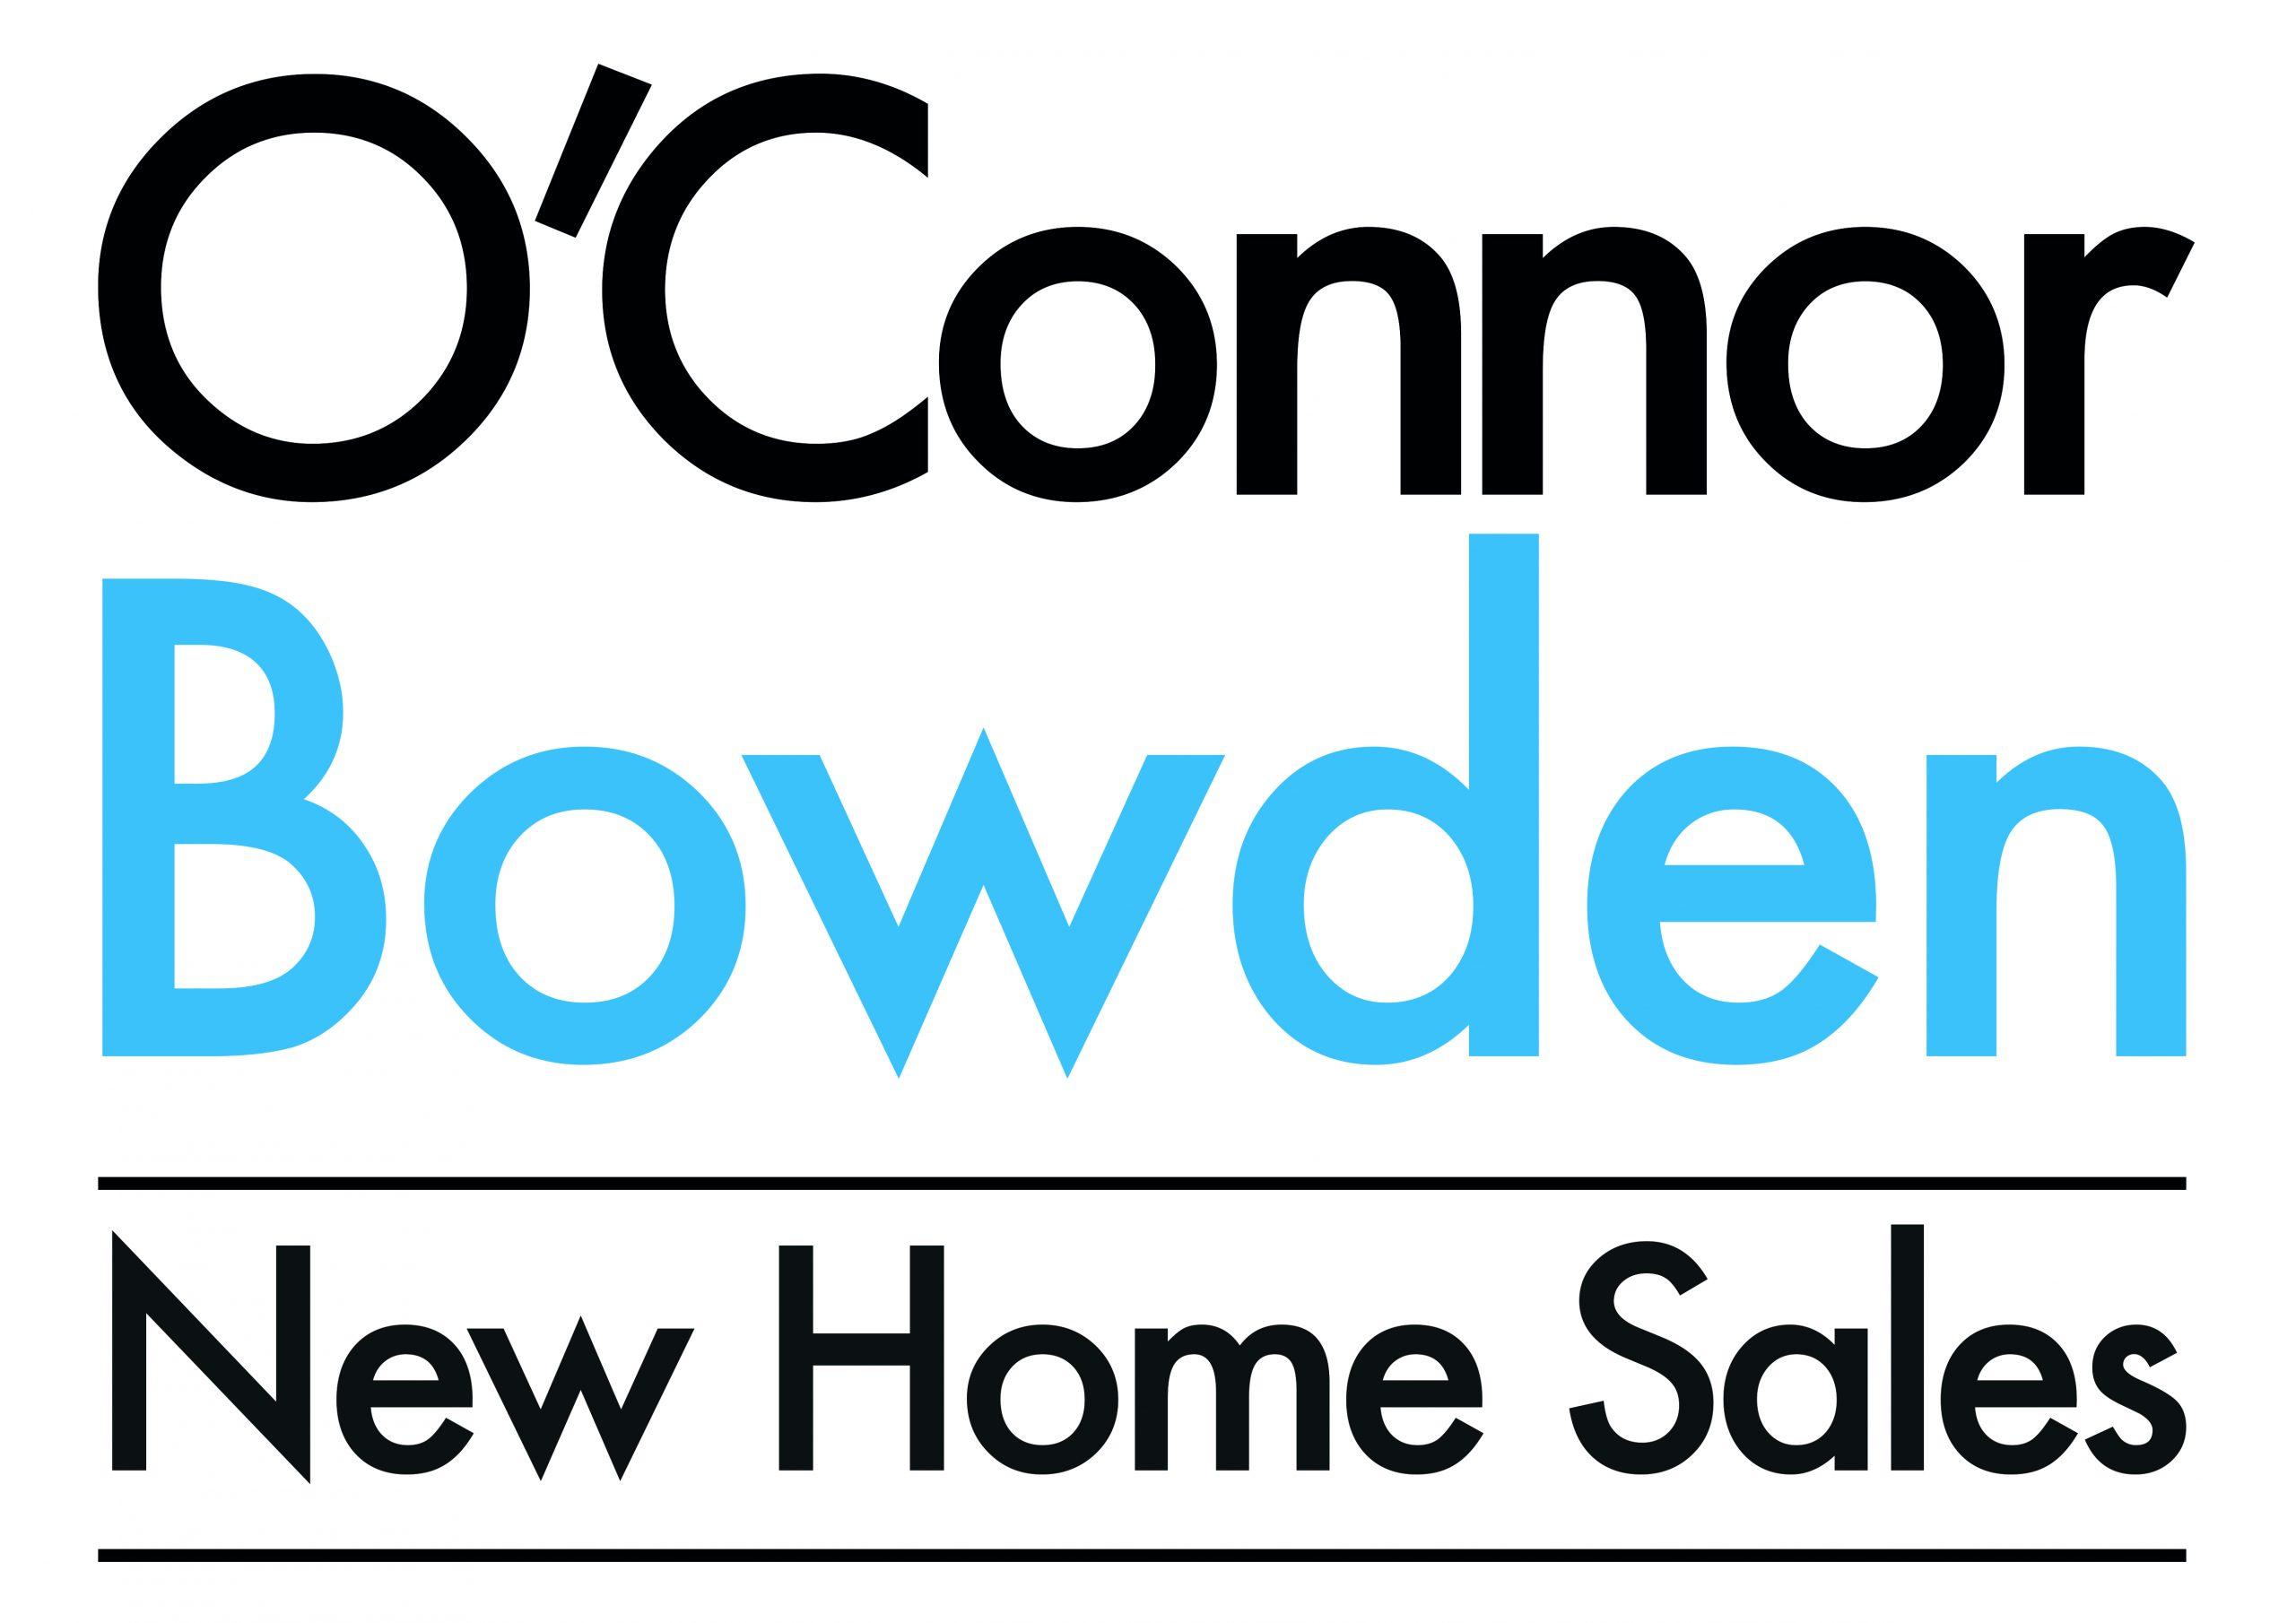 O Connor Bowden New Home Sales